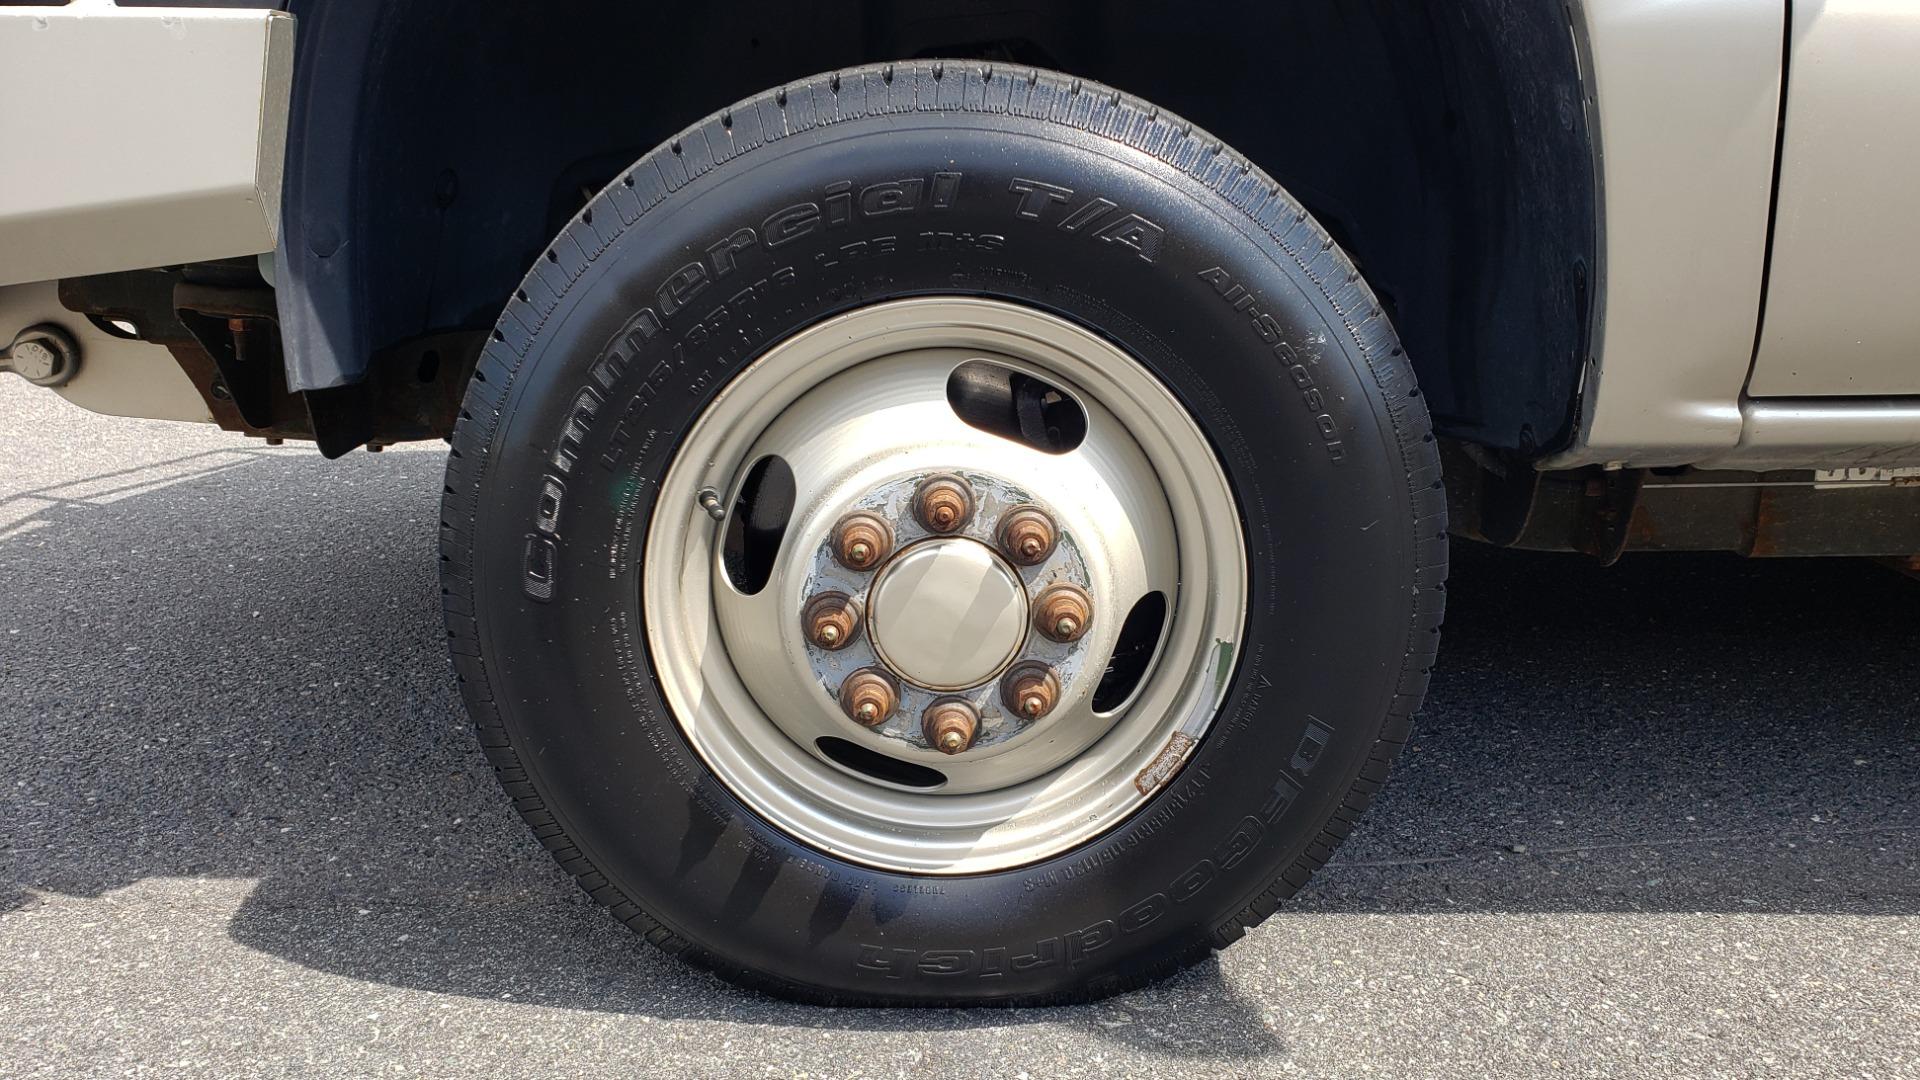 Used 2005 Chevrolet SILVERADO 3500 DRW / 4WD / REG CAB / 6.6L DURAMAX / DOOMSDAY PREPPER for sale $21,595 at Formula Imports in Charlotte NC 28227 55